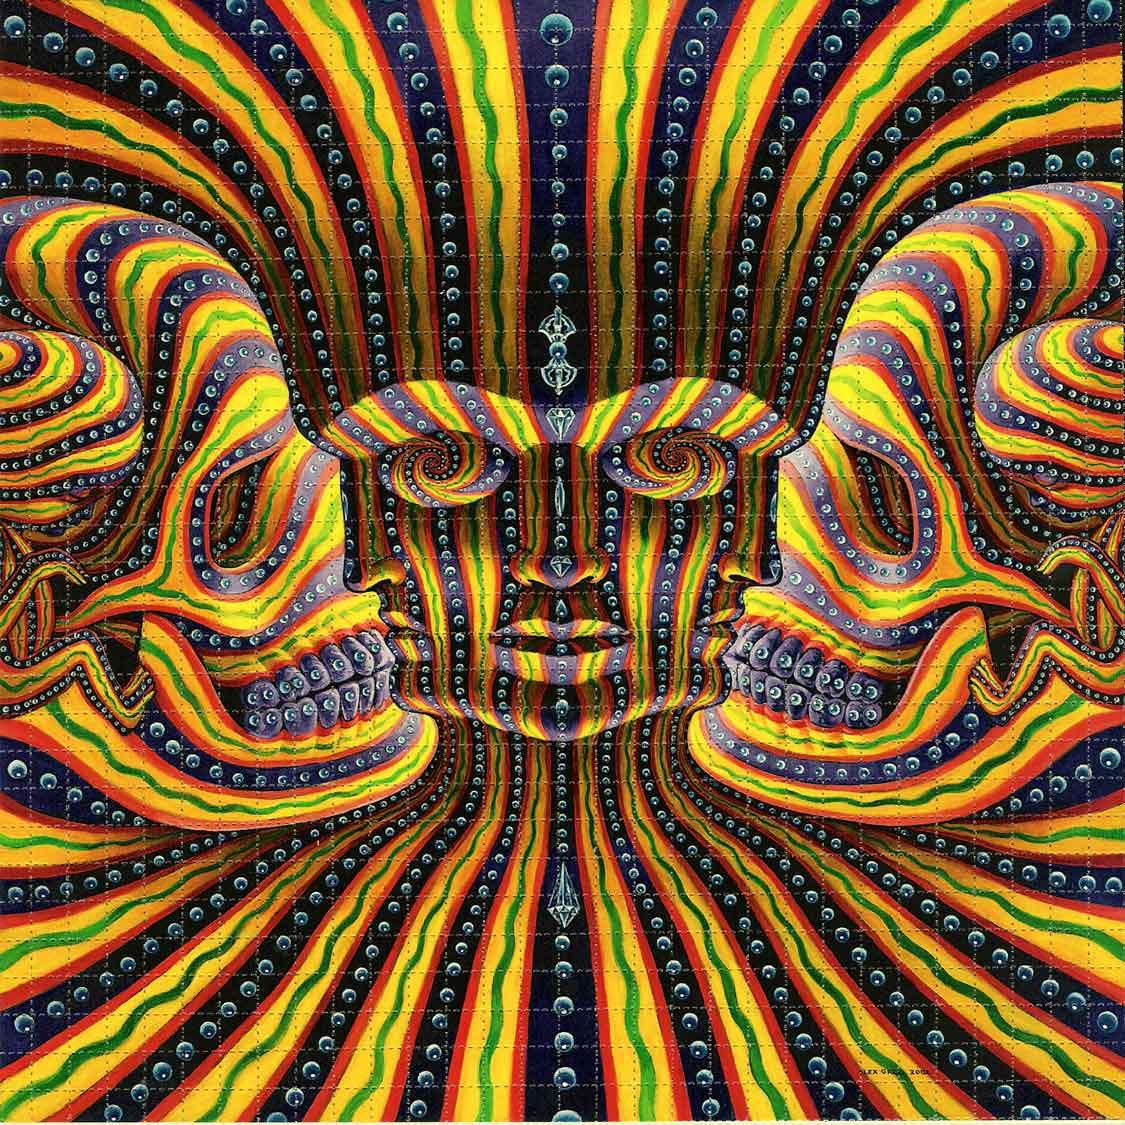 Cosmic Creativity  How Art Evolves ConsciousnessAlex Grey Art